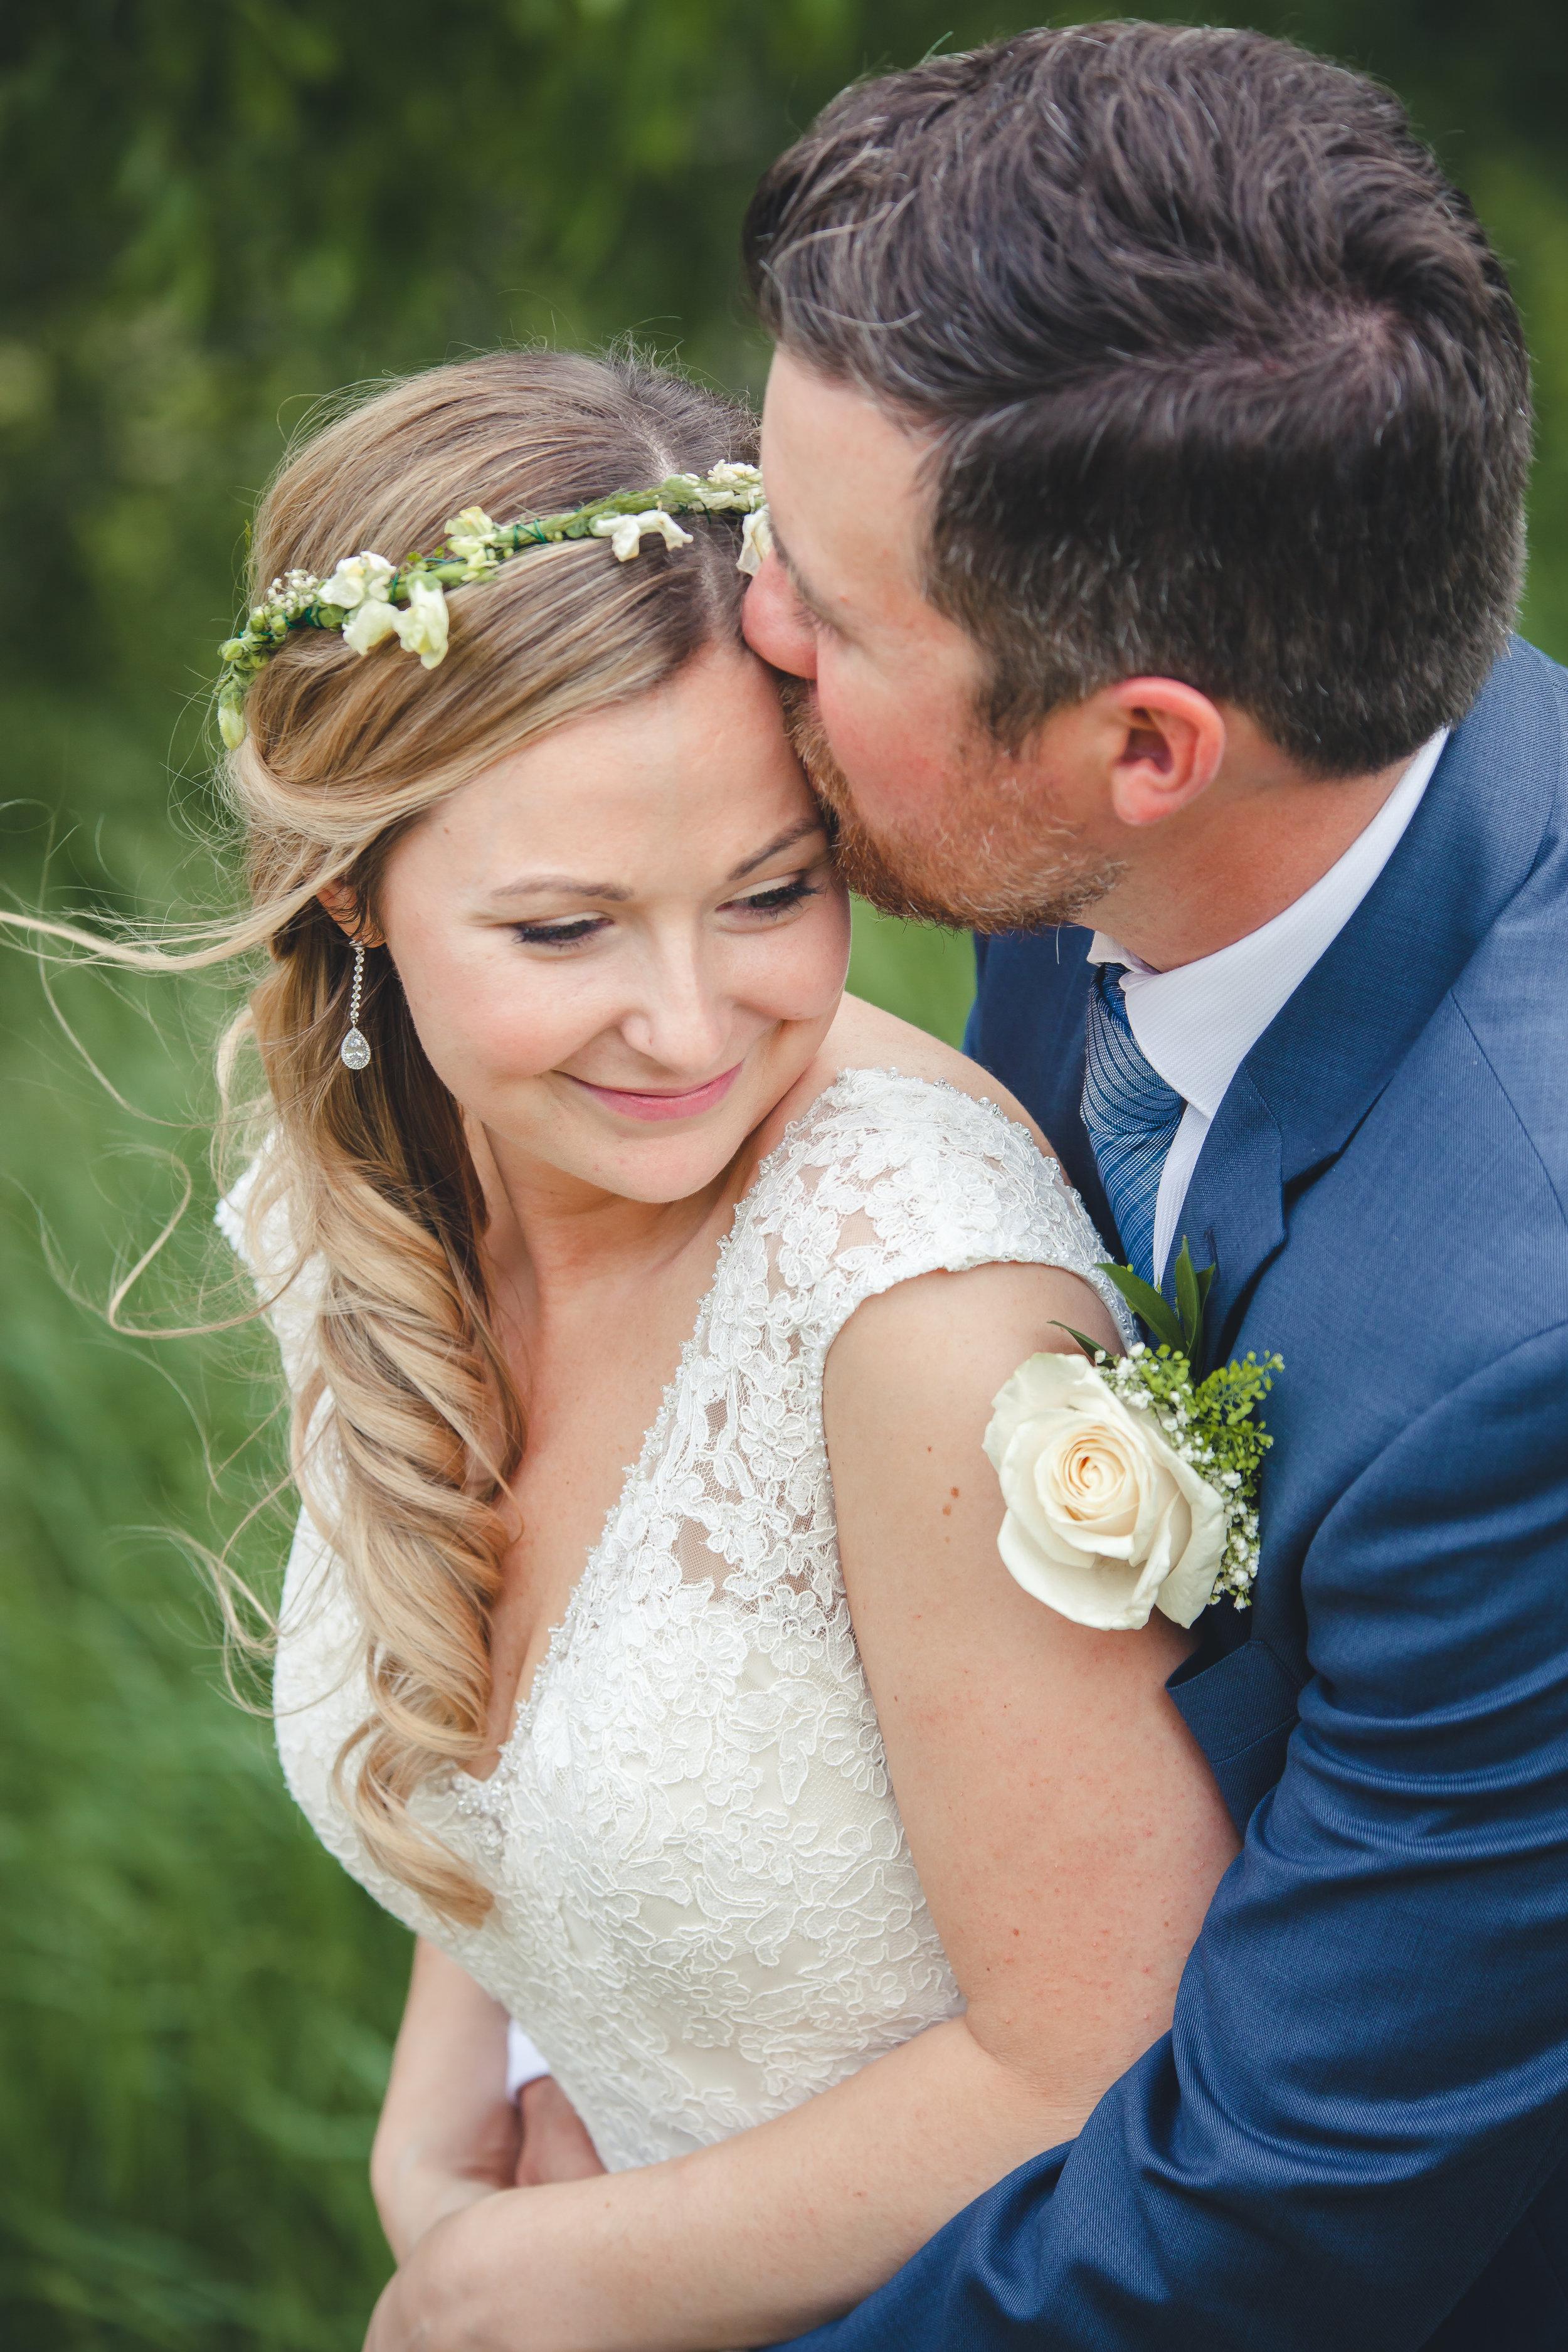 Amy D Photography Barrie and Muskoka Wedding Photography Barrie Country Club_-44.jpg